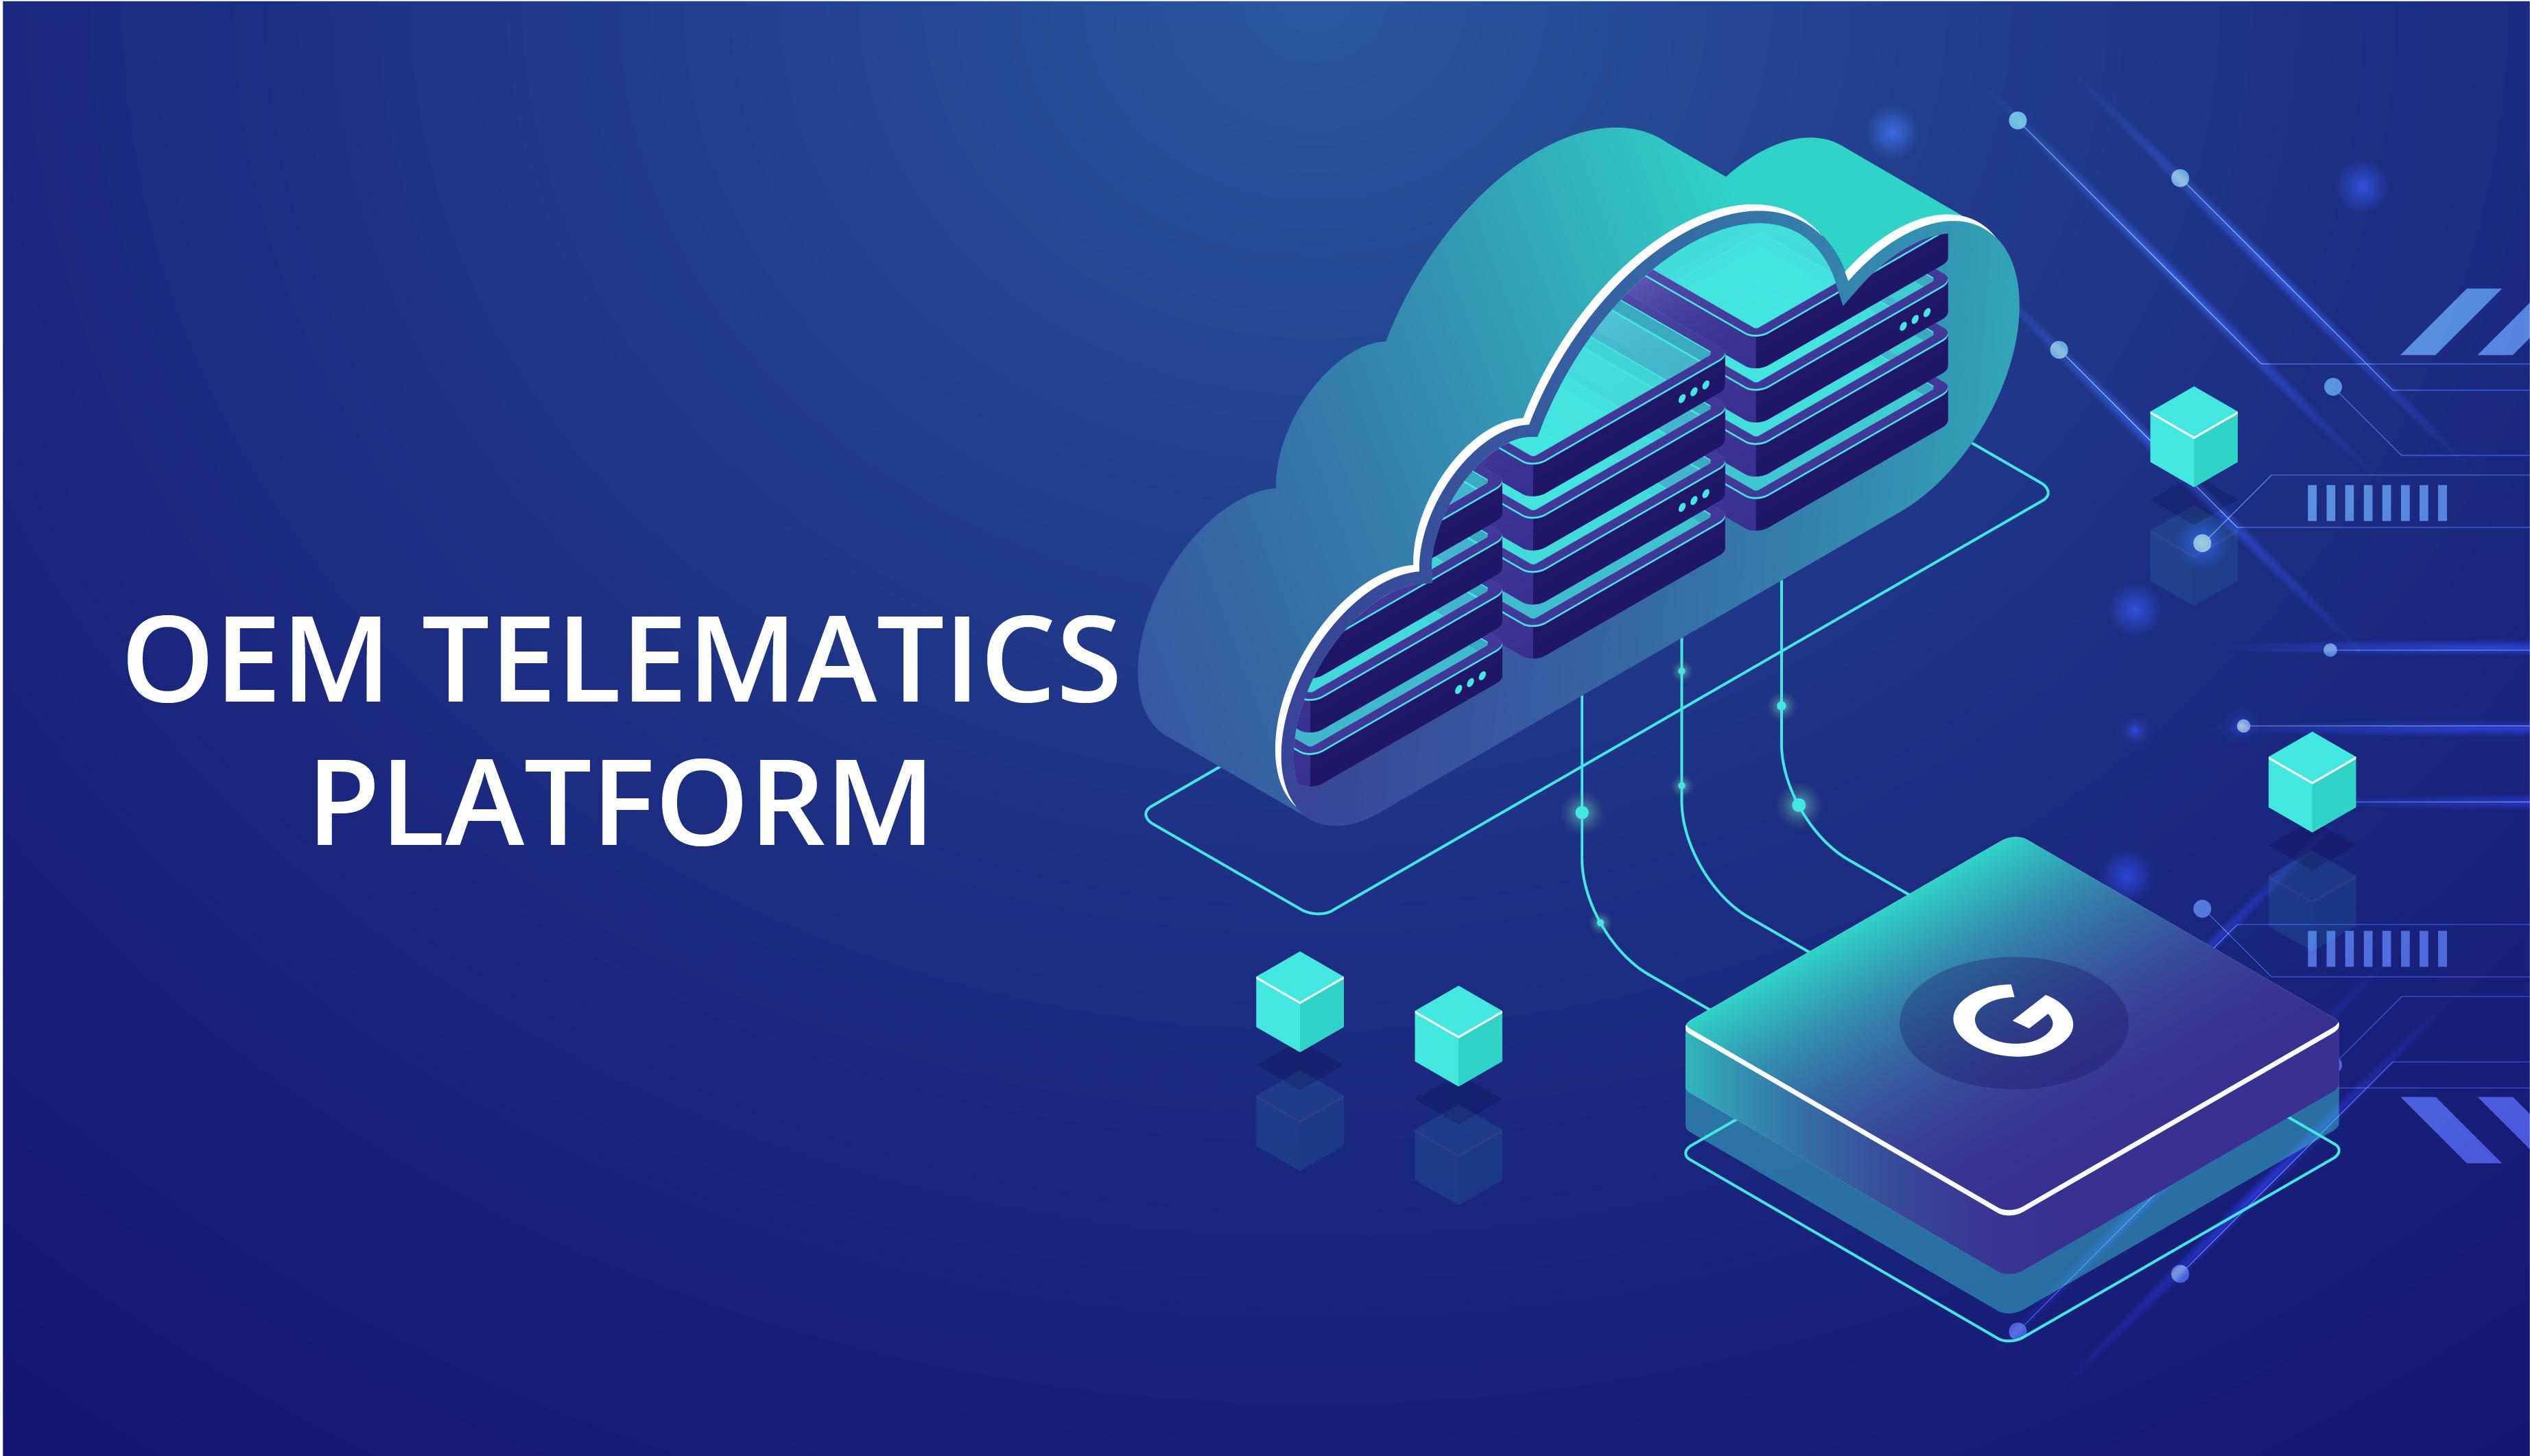 Geotab develops an OEM Telematics Platform